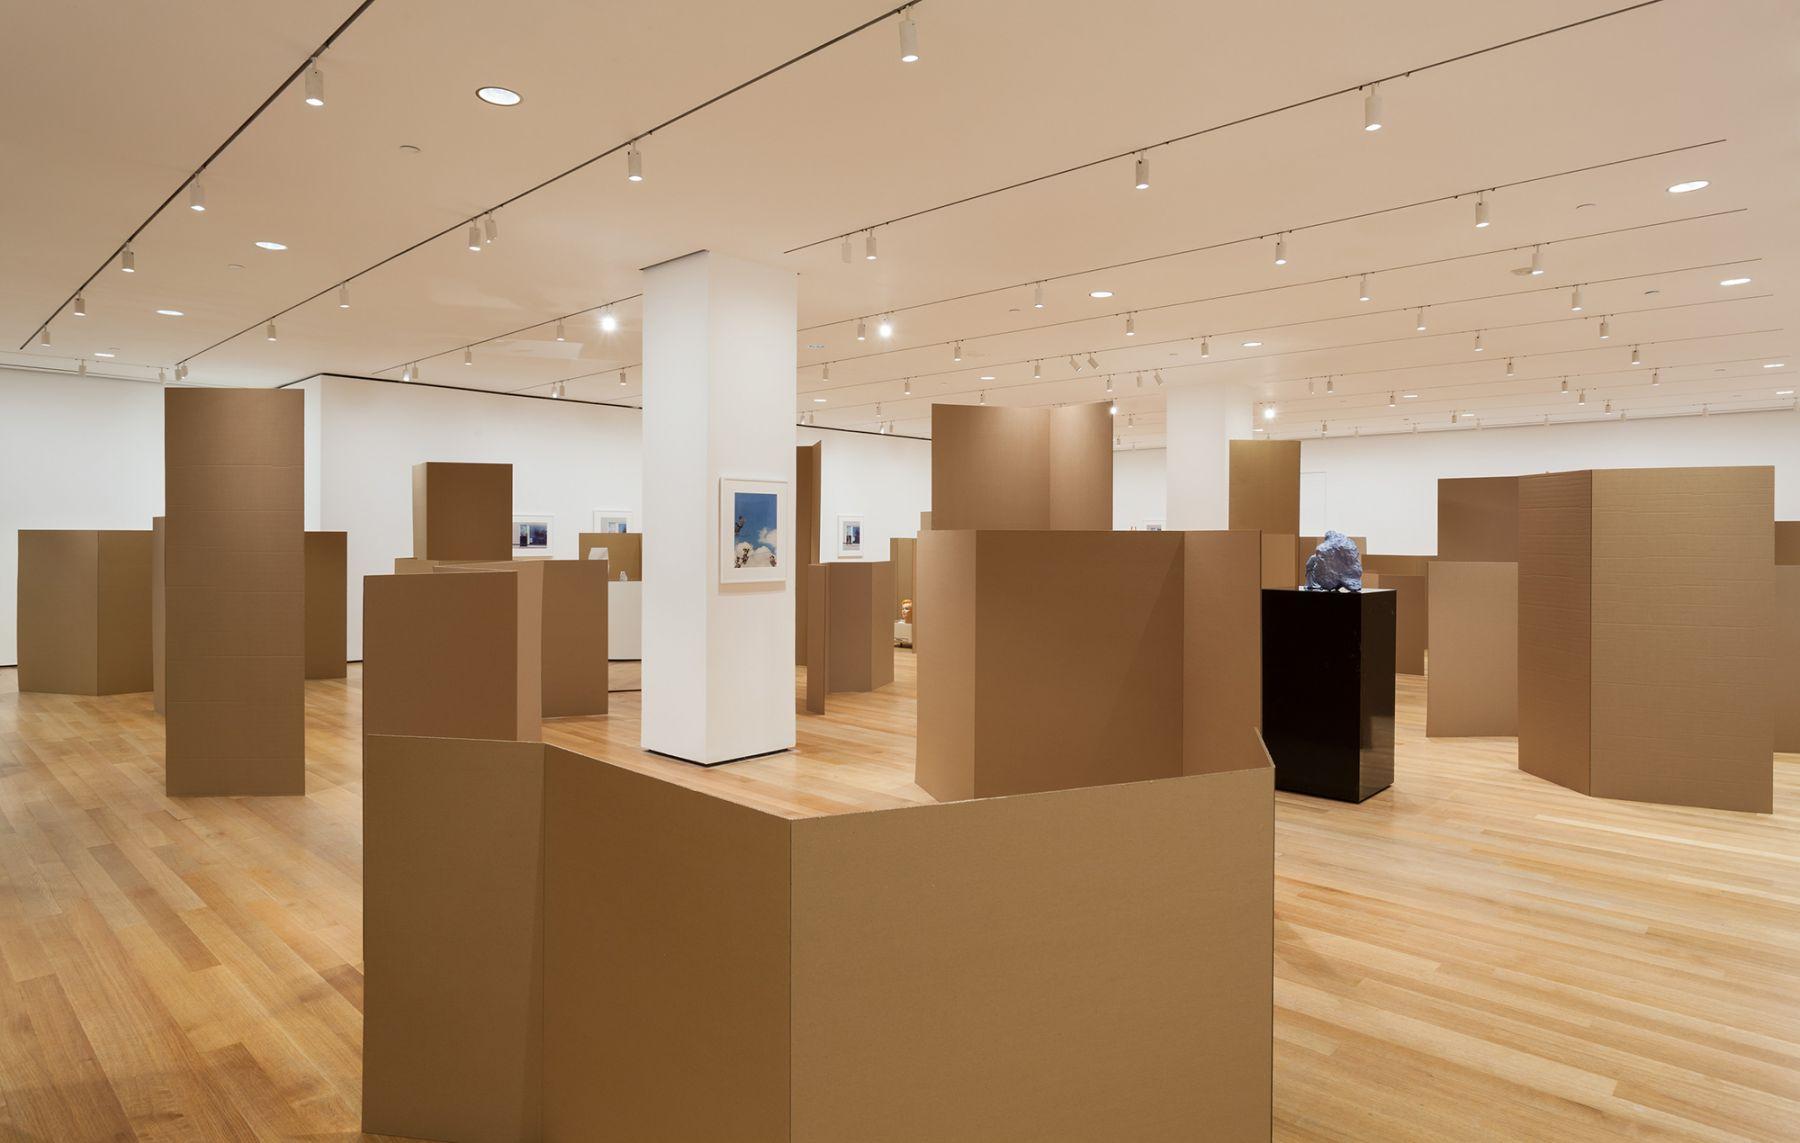 Installation view, Rachel Harrison: Perth Amboy, curated by Paulina Pobocha, Museum of Modern Art, New York, 2016